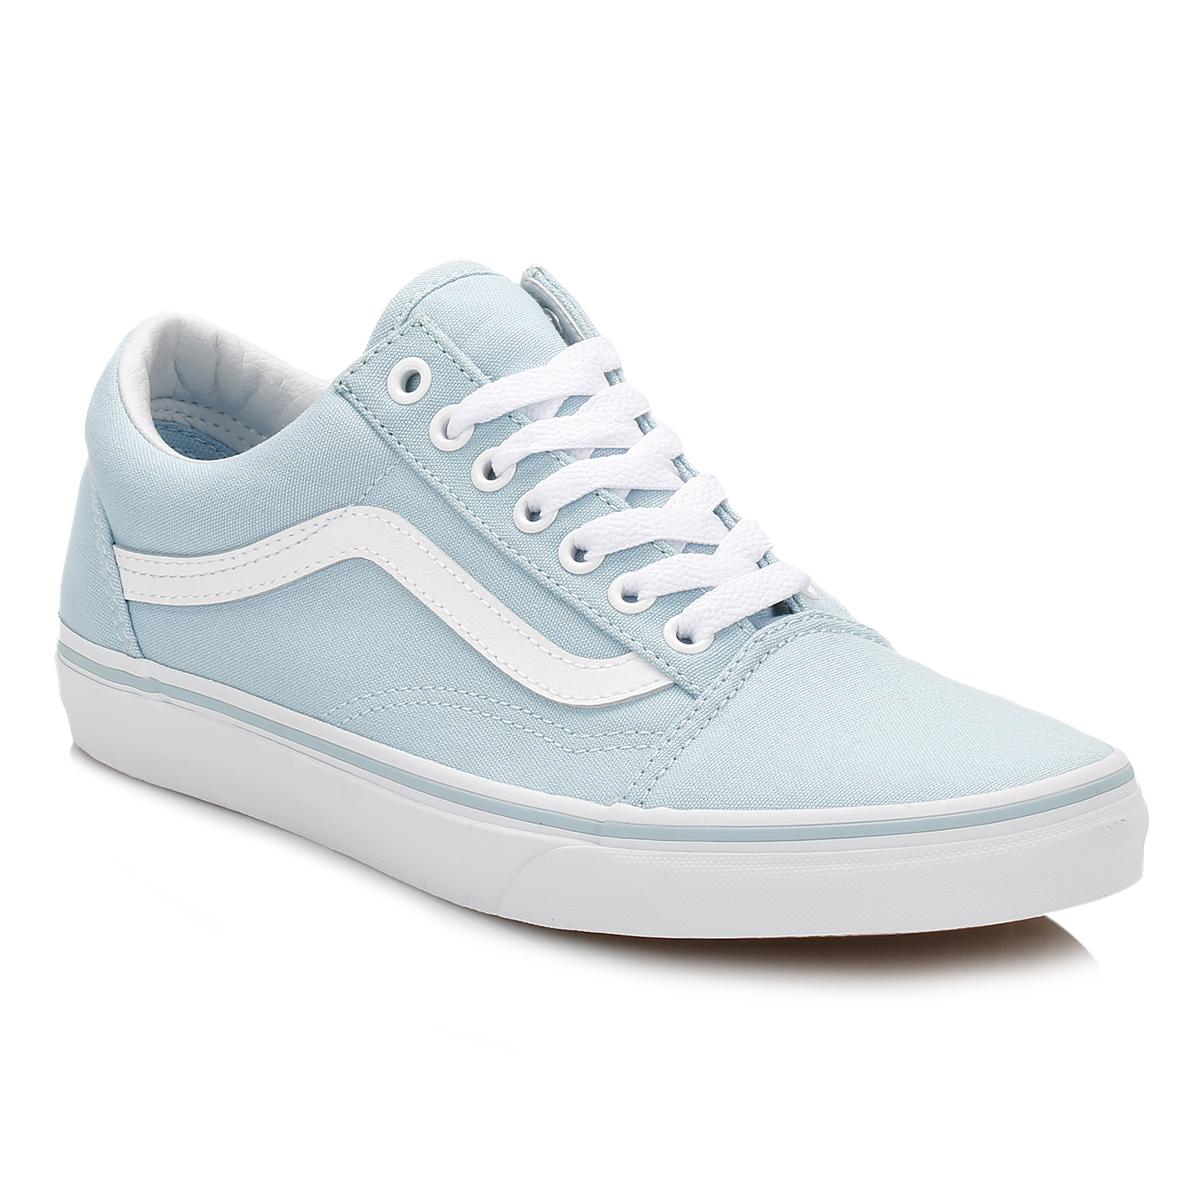 imagenes zapatos vans para mujer